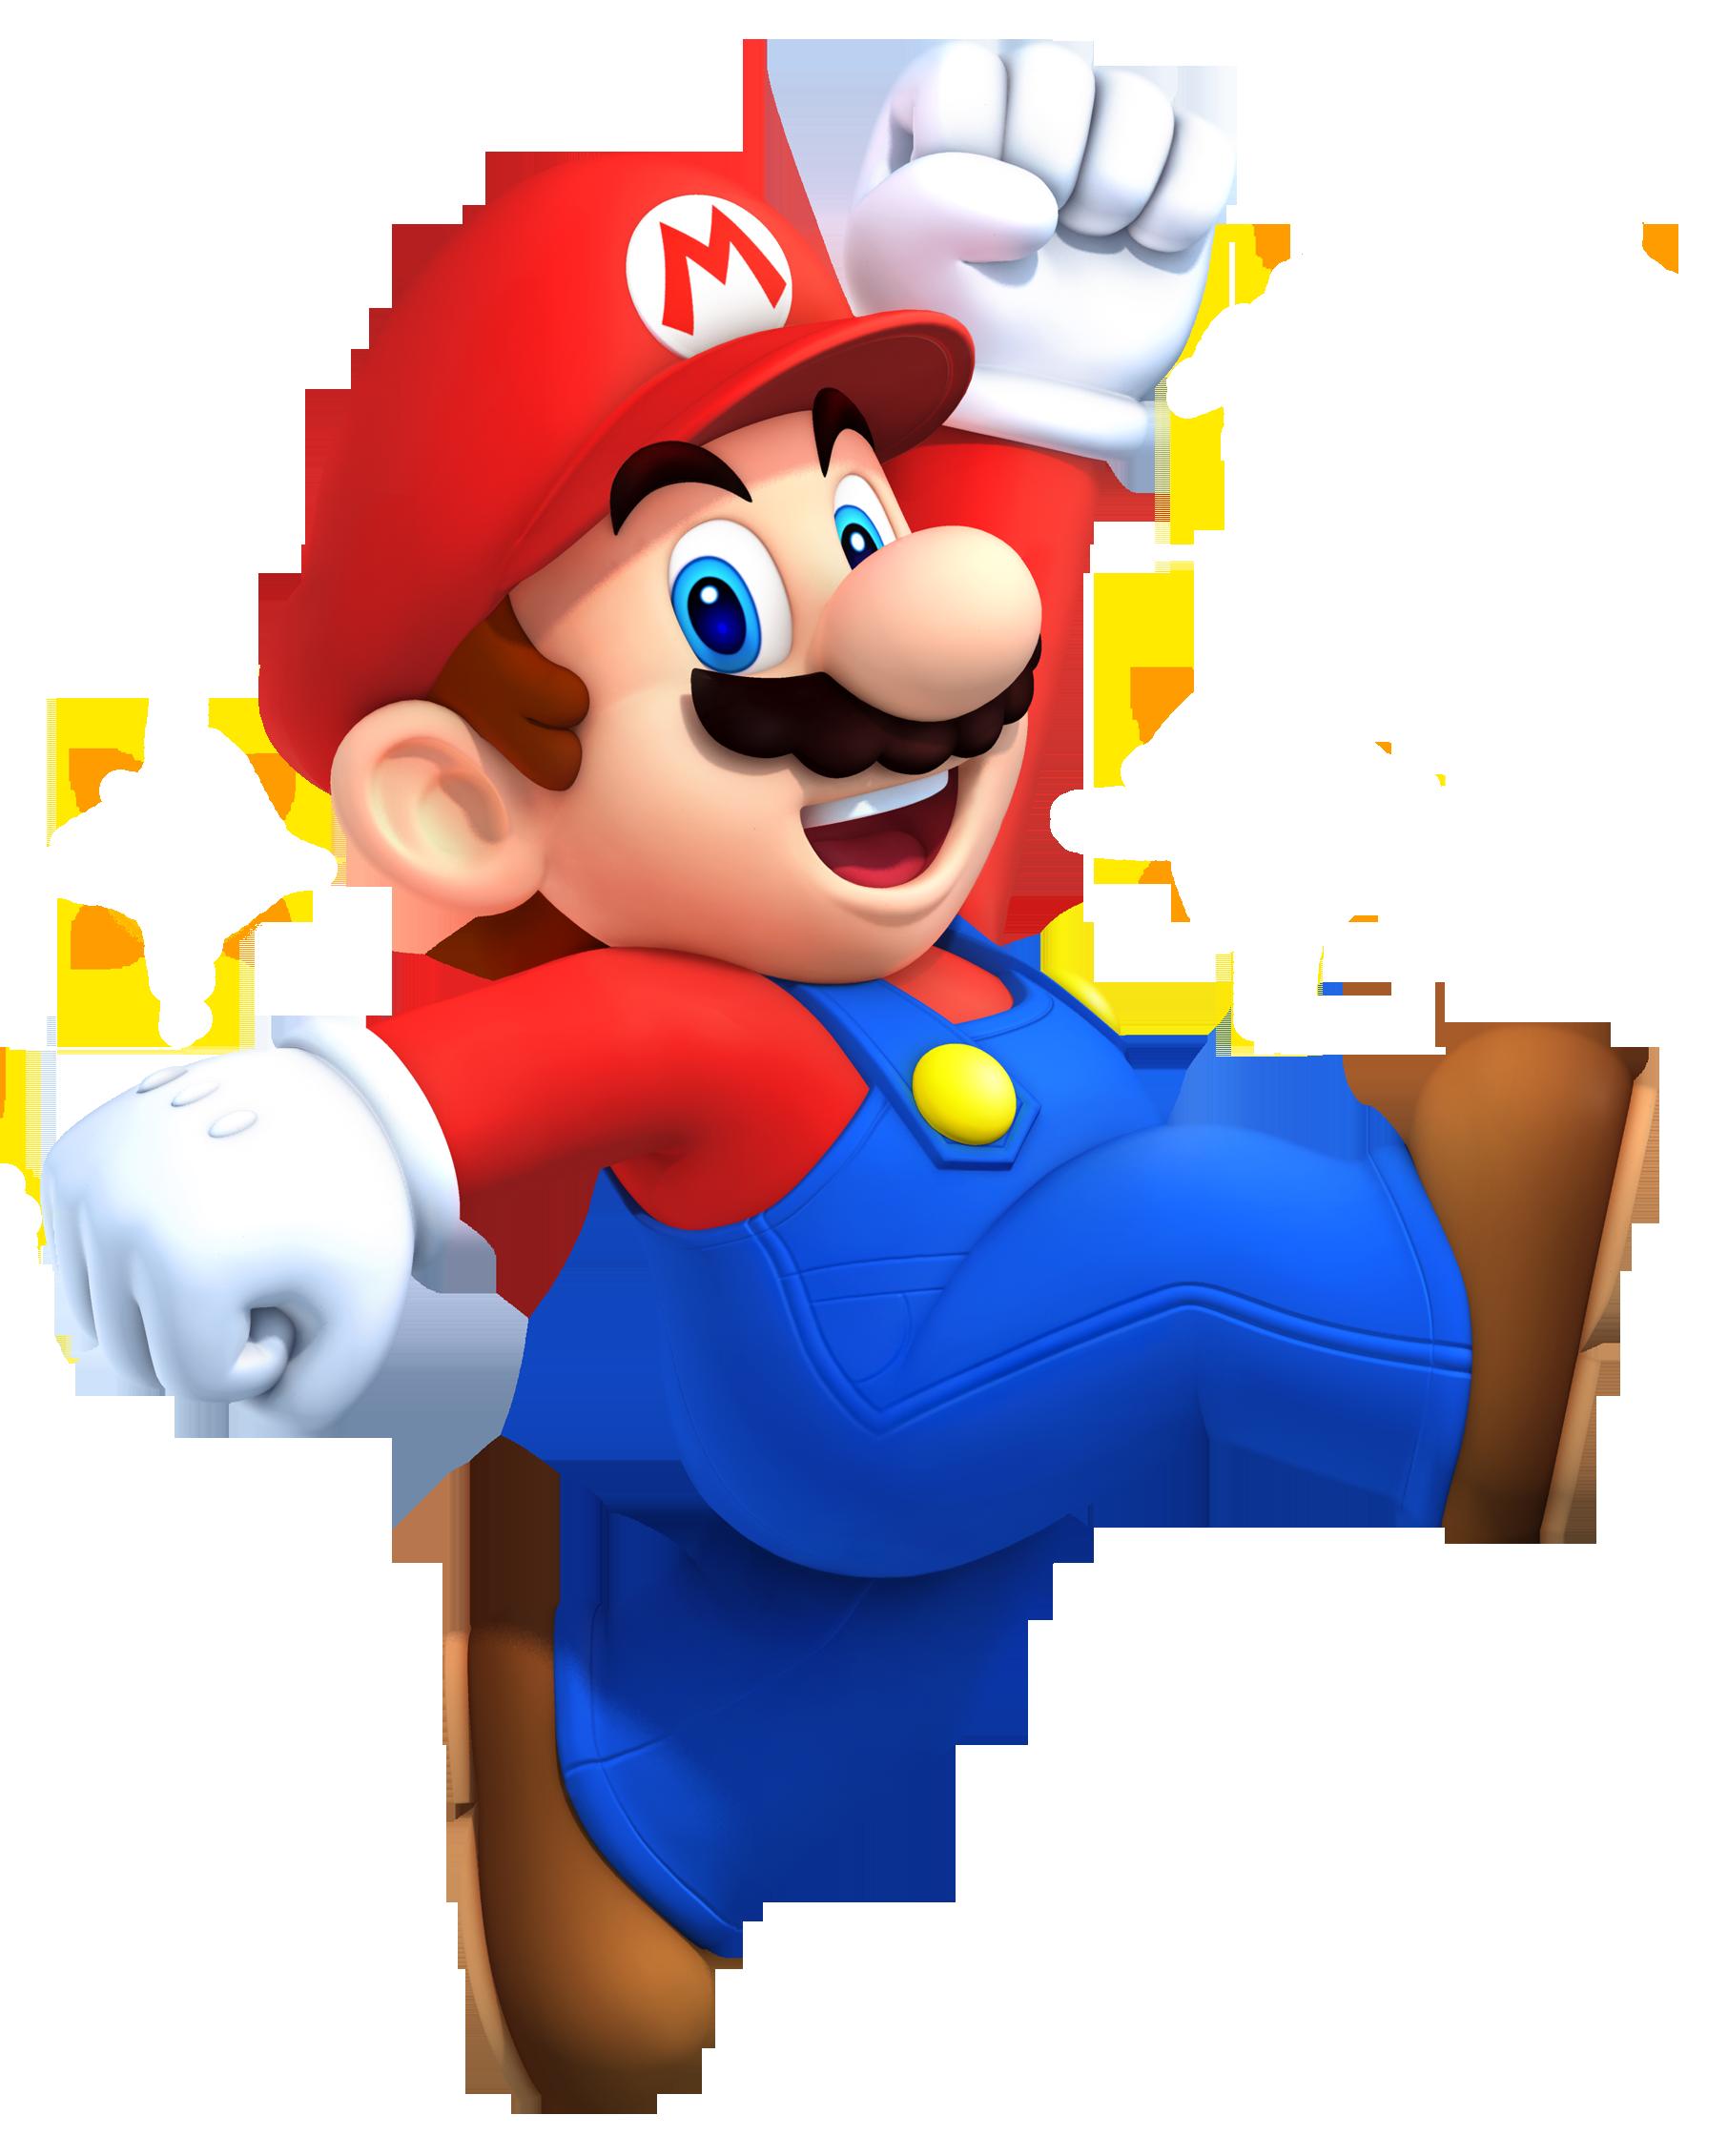 Mario's artwork from New Super Mario Bros. 2